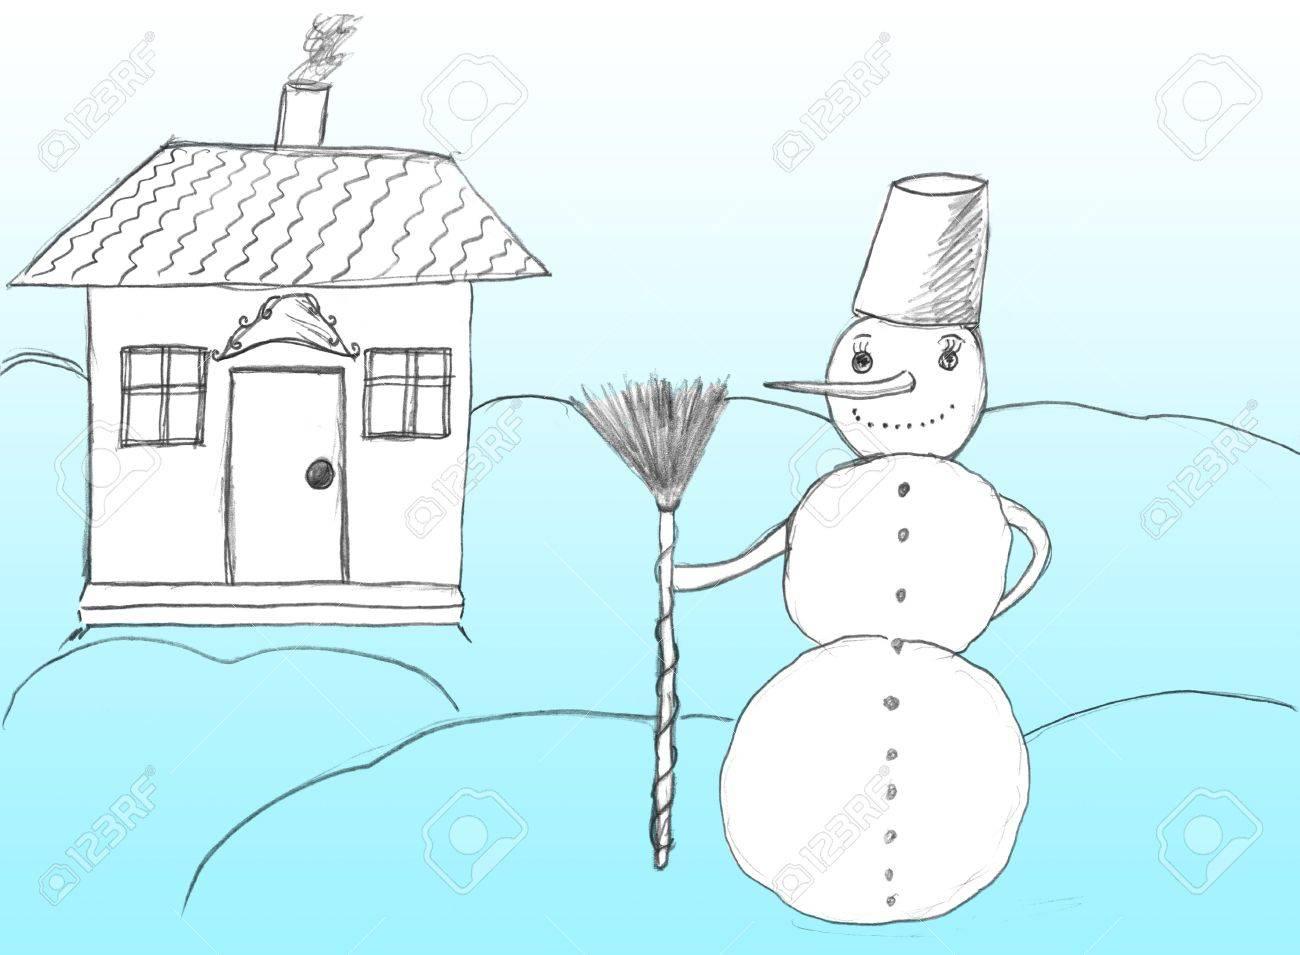 Christmas House Drawing.Christmas Snowman Near House Drawing